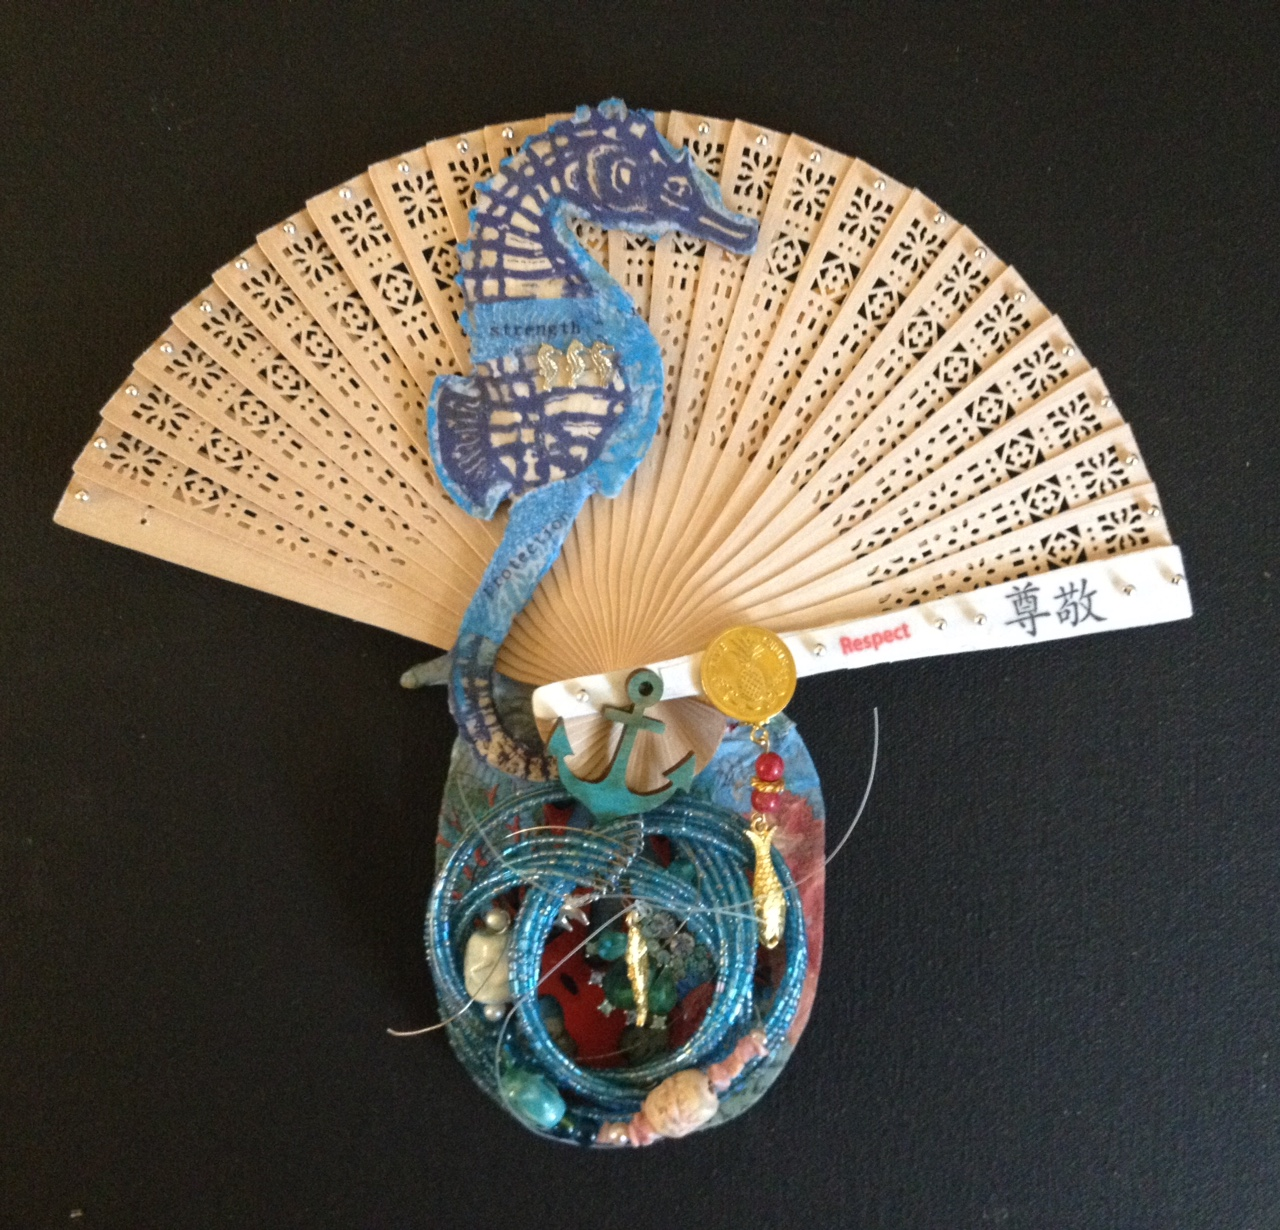 Sea.Fan.Prayer4Protection